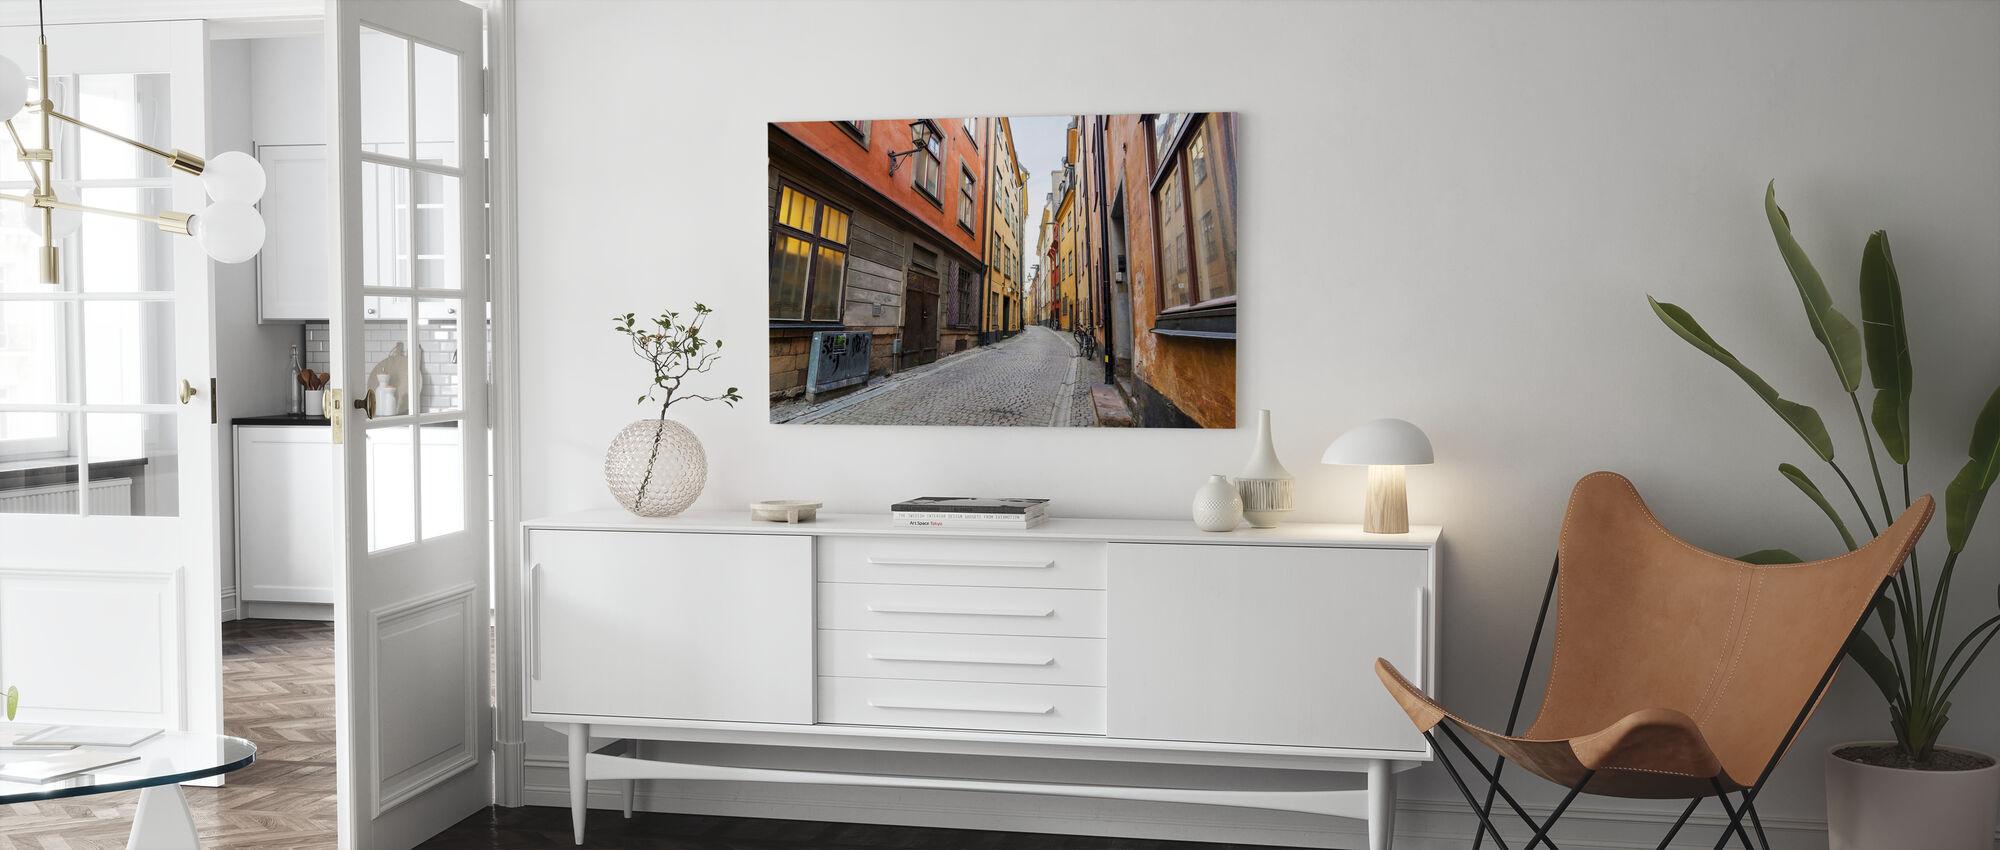 Strada a Gamla Stan Stockholm - Stampa su tela - Salotto